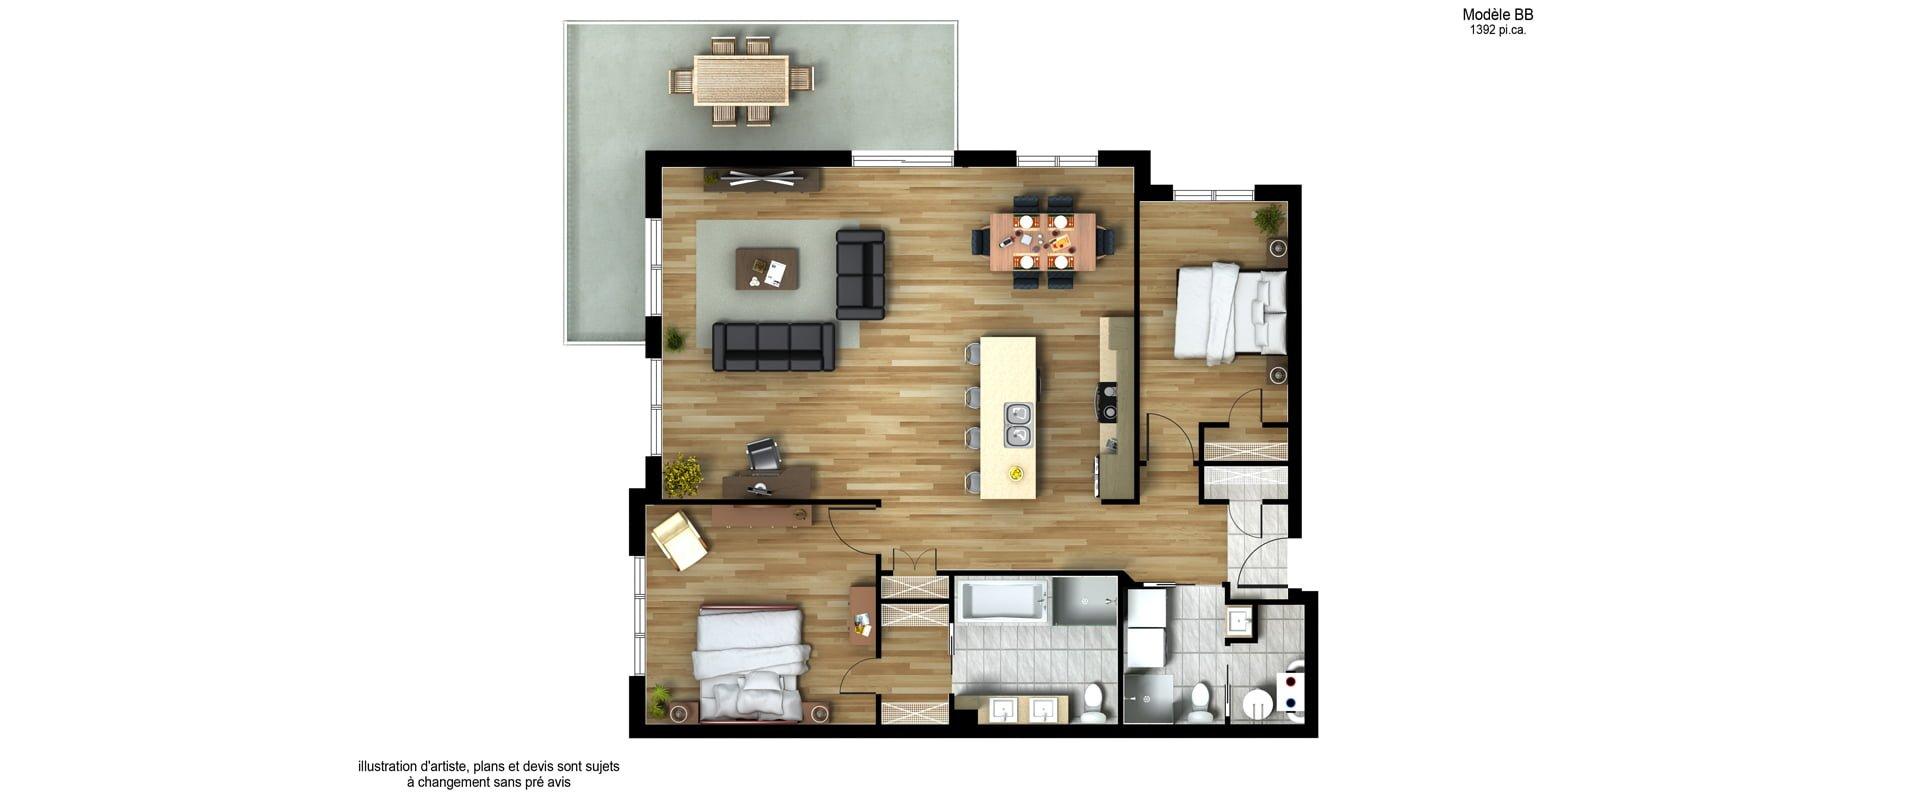 Les Habitations Innovatel condos neufs X15 Mirabel modèle BB